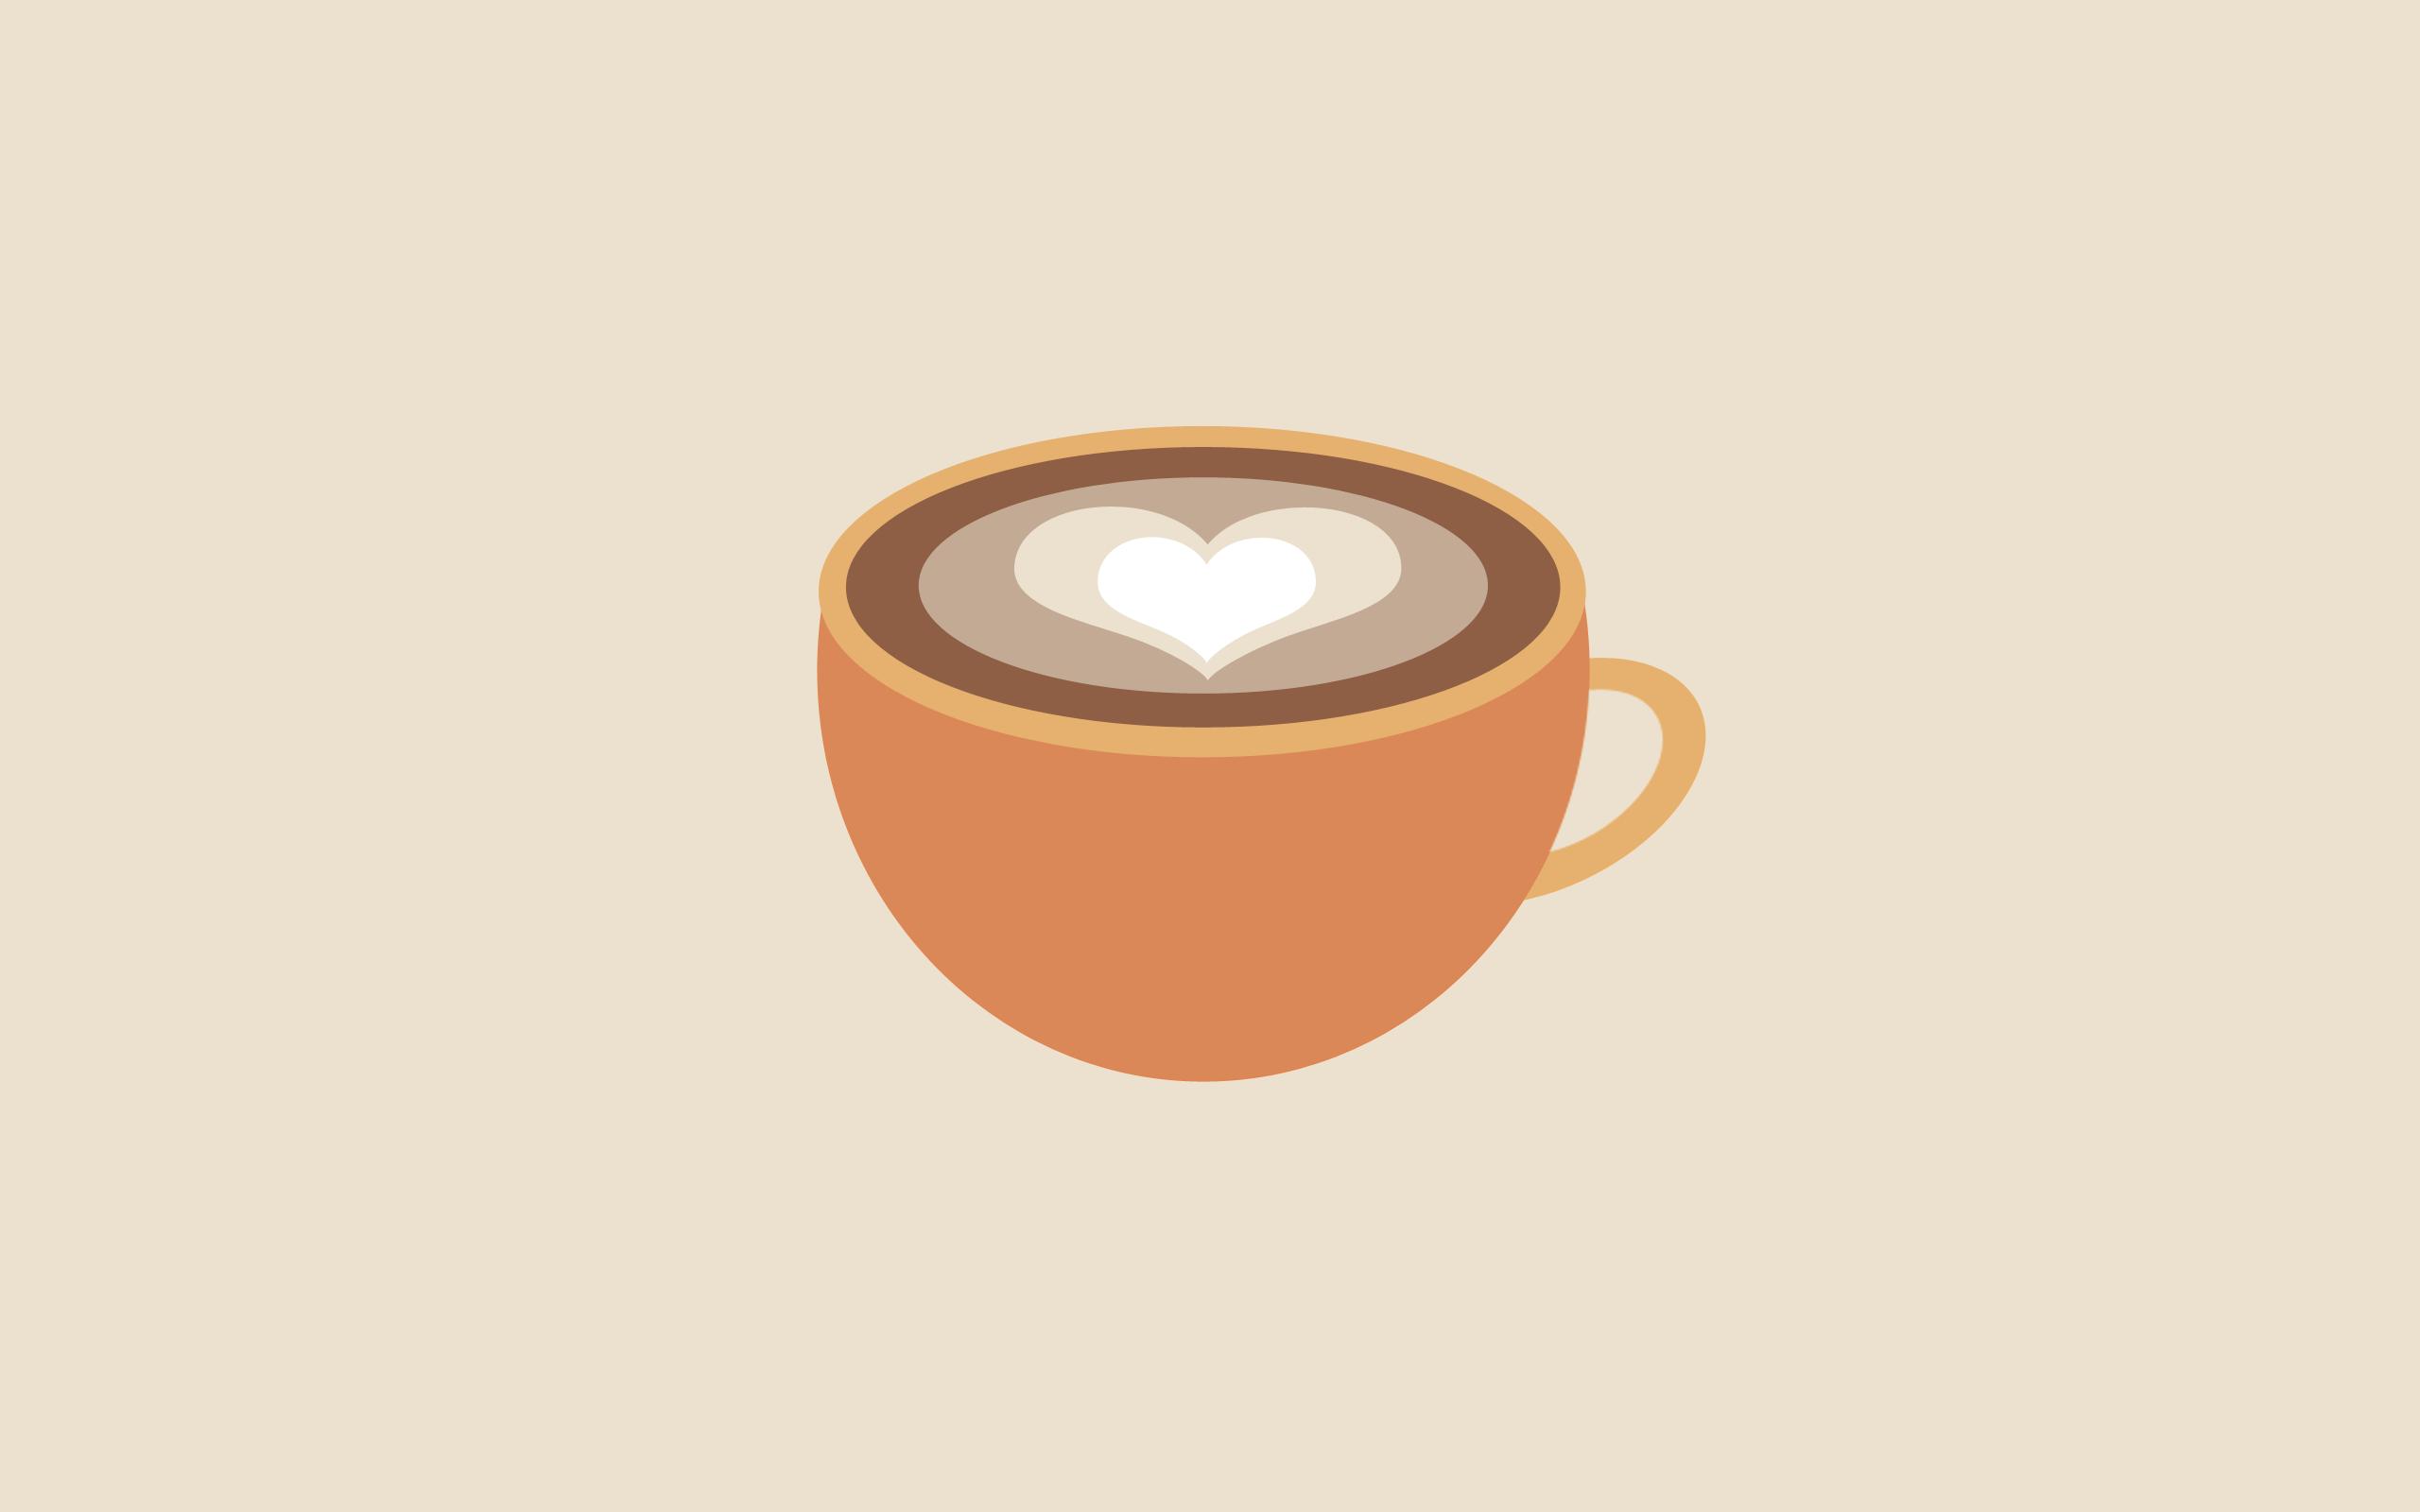 Wallpaper : illustration, digital art, minimalism, drink, simple, espresso, caffeine, hand ...